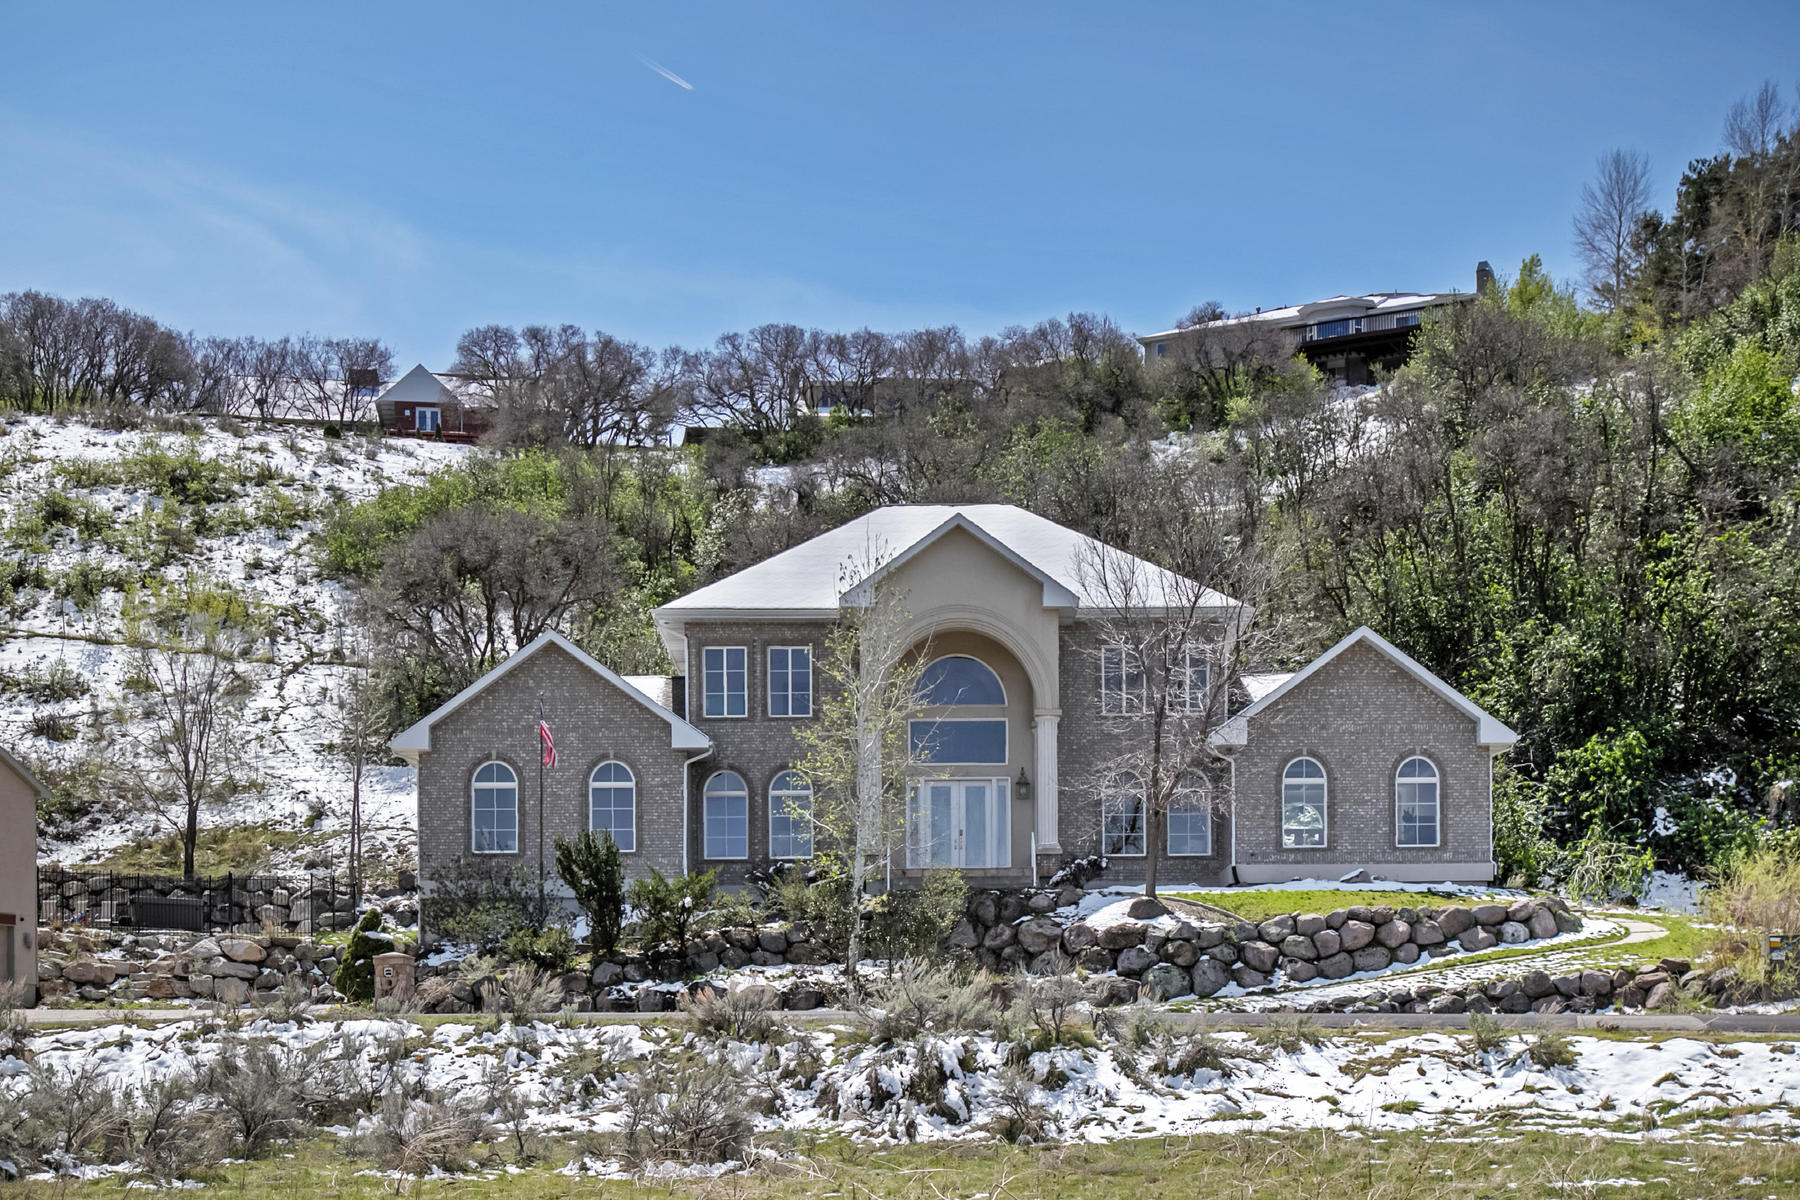 Villa per Vendita alle ore Utah 1996 statehood centennial show home 2672 Dimple Dell Rd Sandy, Utah, 84092 Stati Uniti